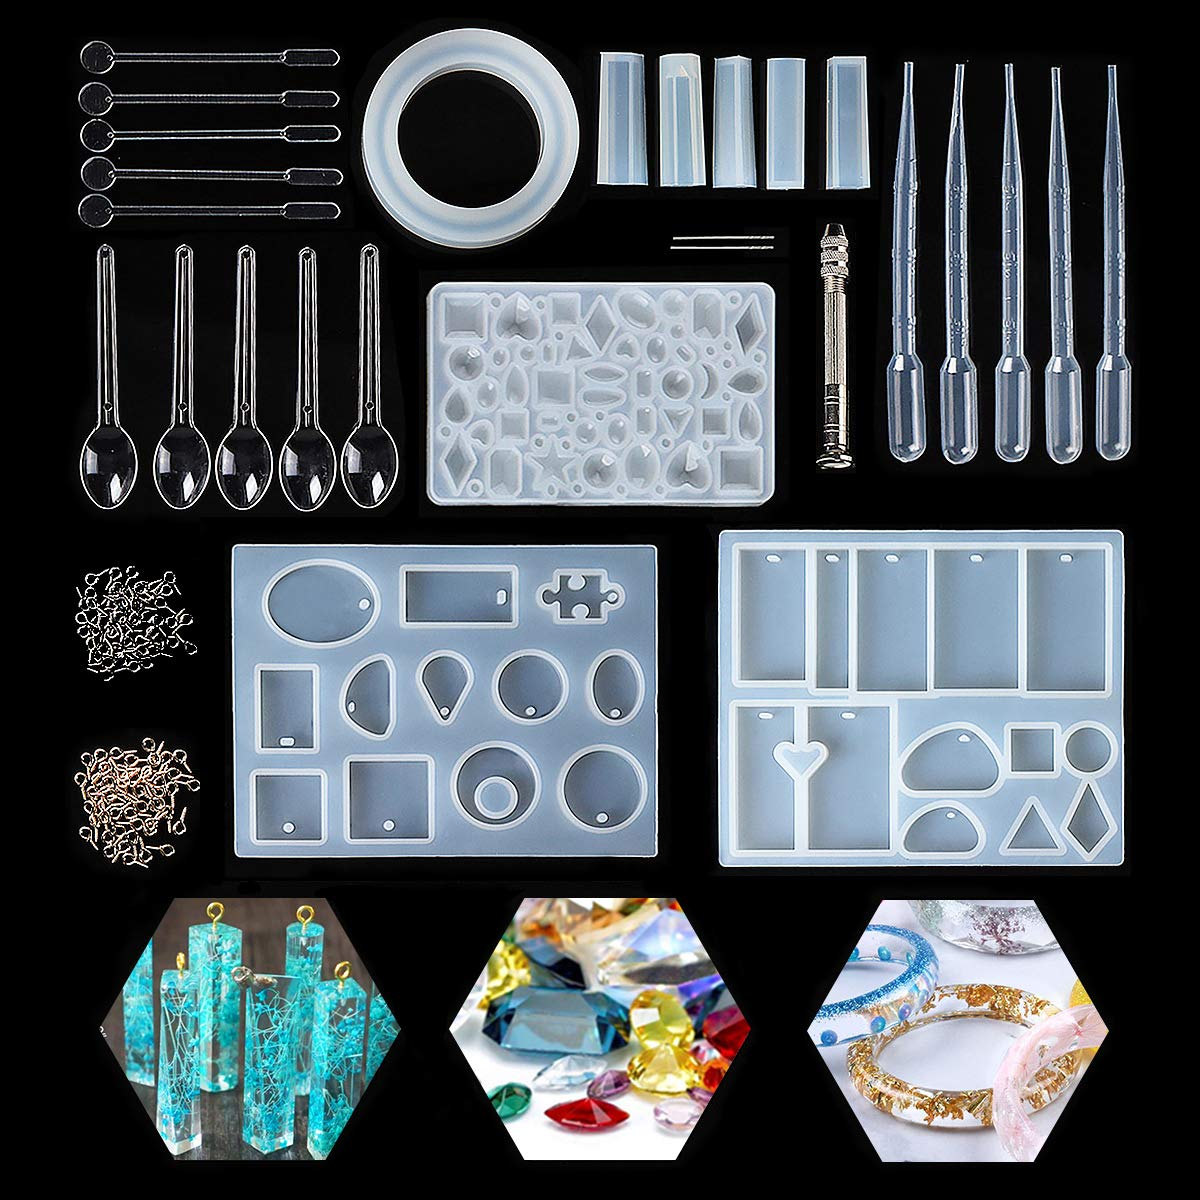 Jeteven Gießform Silikonform Kit Resin Mold Harz Form für Schmuckherstellung